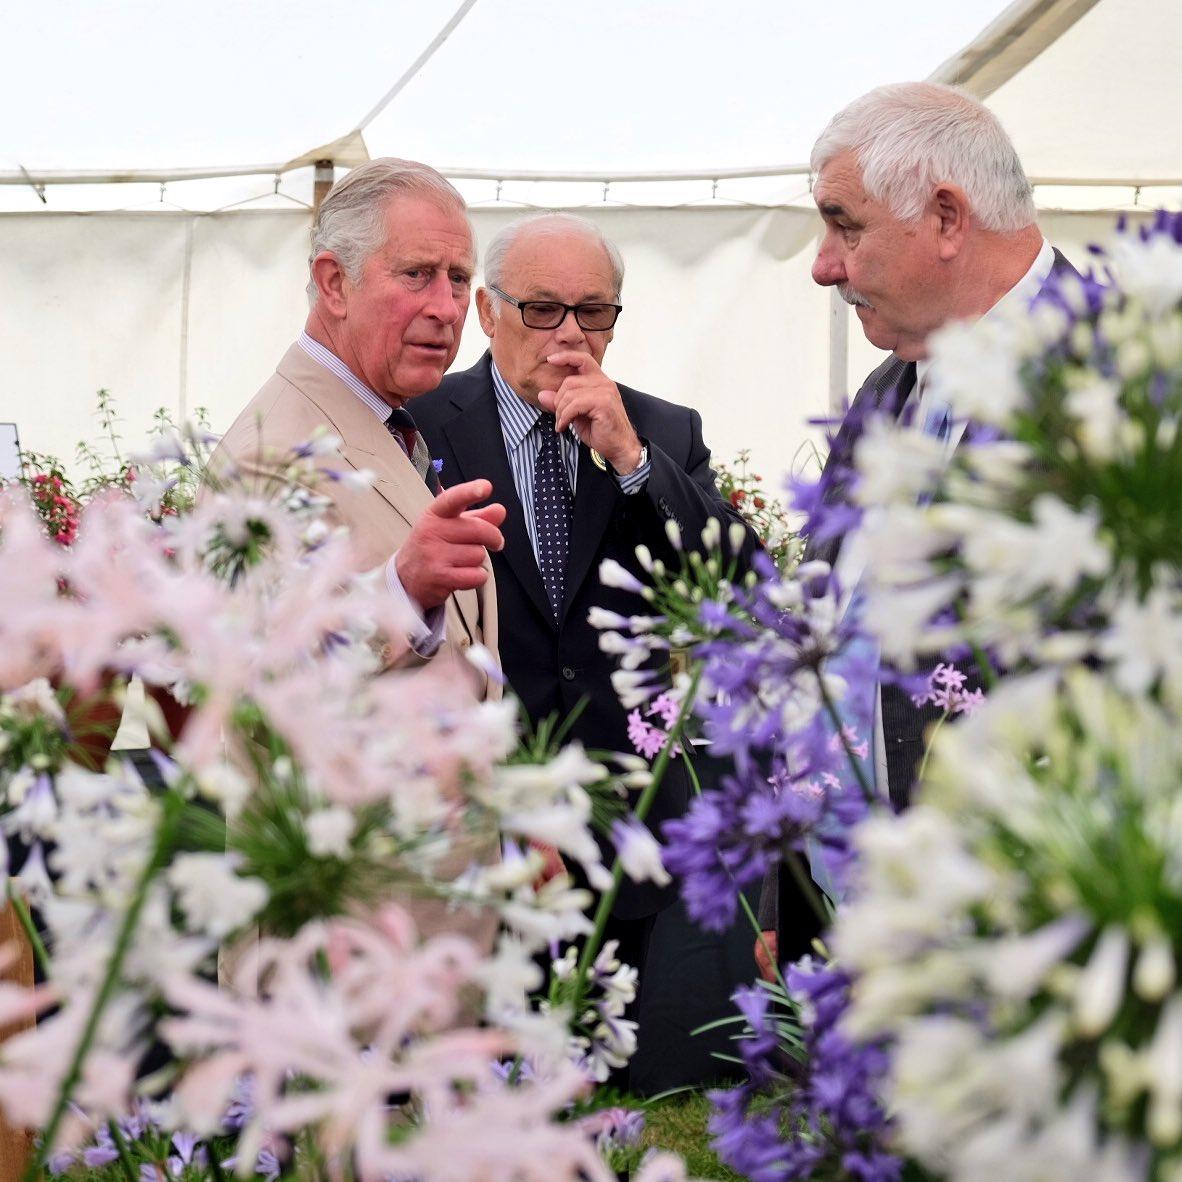 Обзор мероприятий принца Чарльза и герцогини Камиллы. Лето